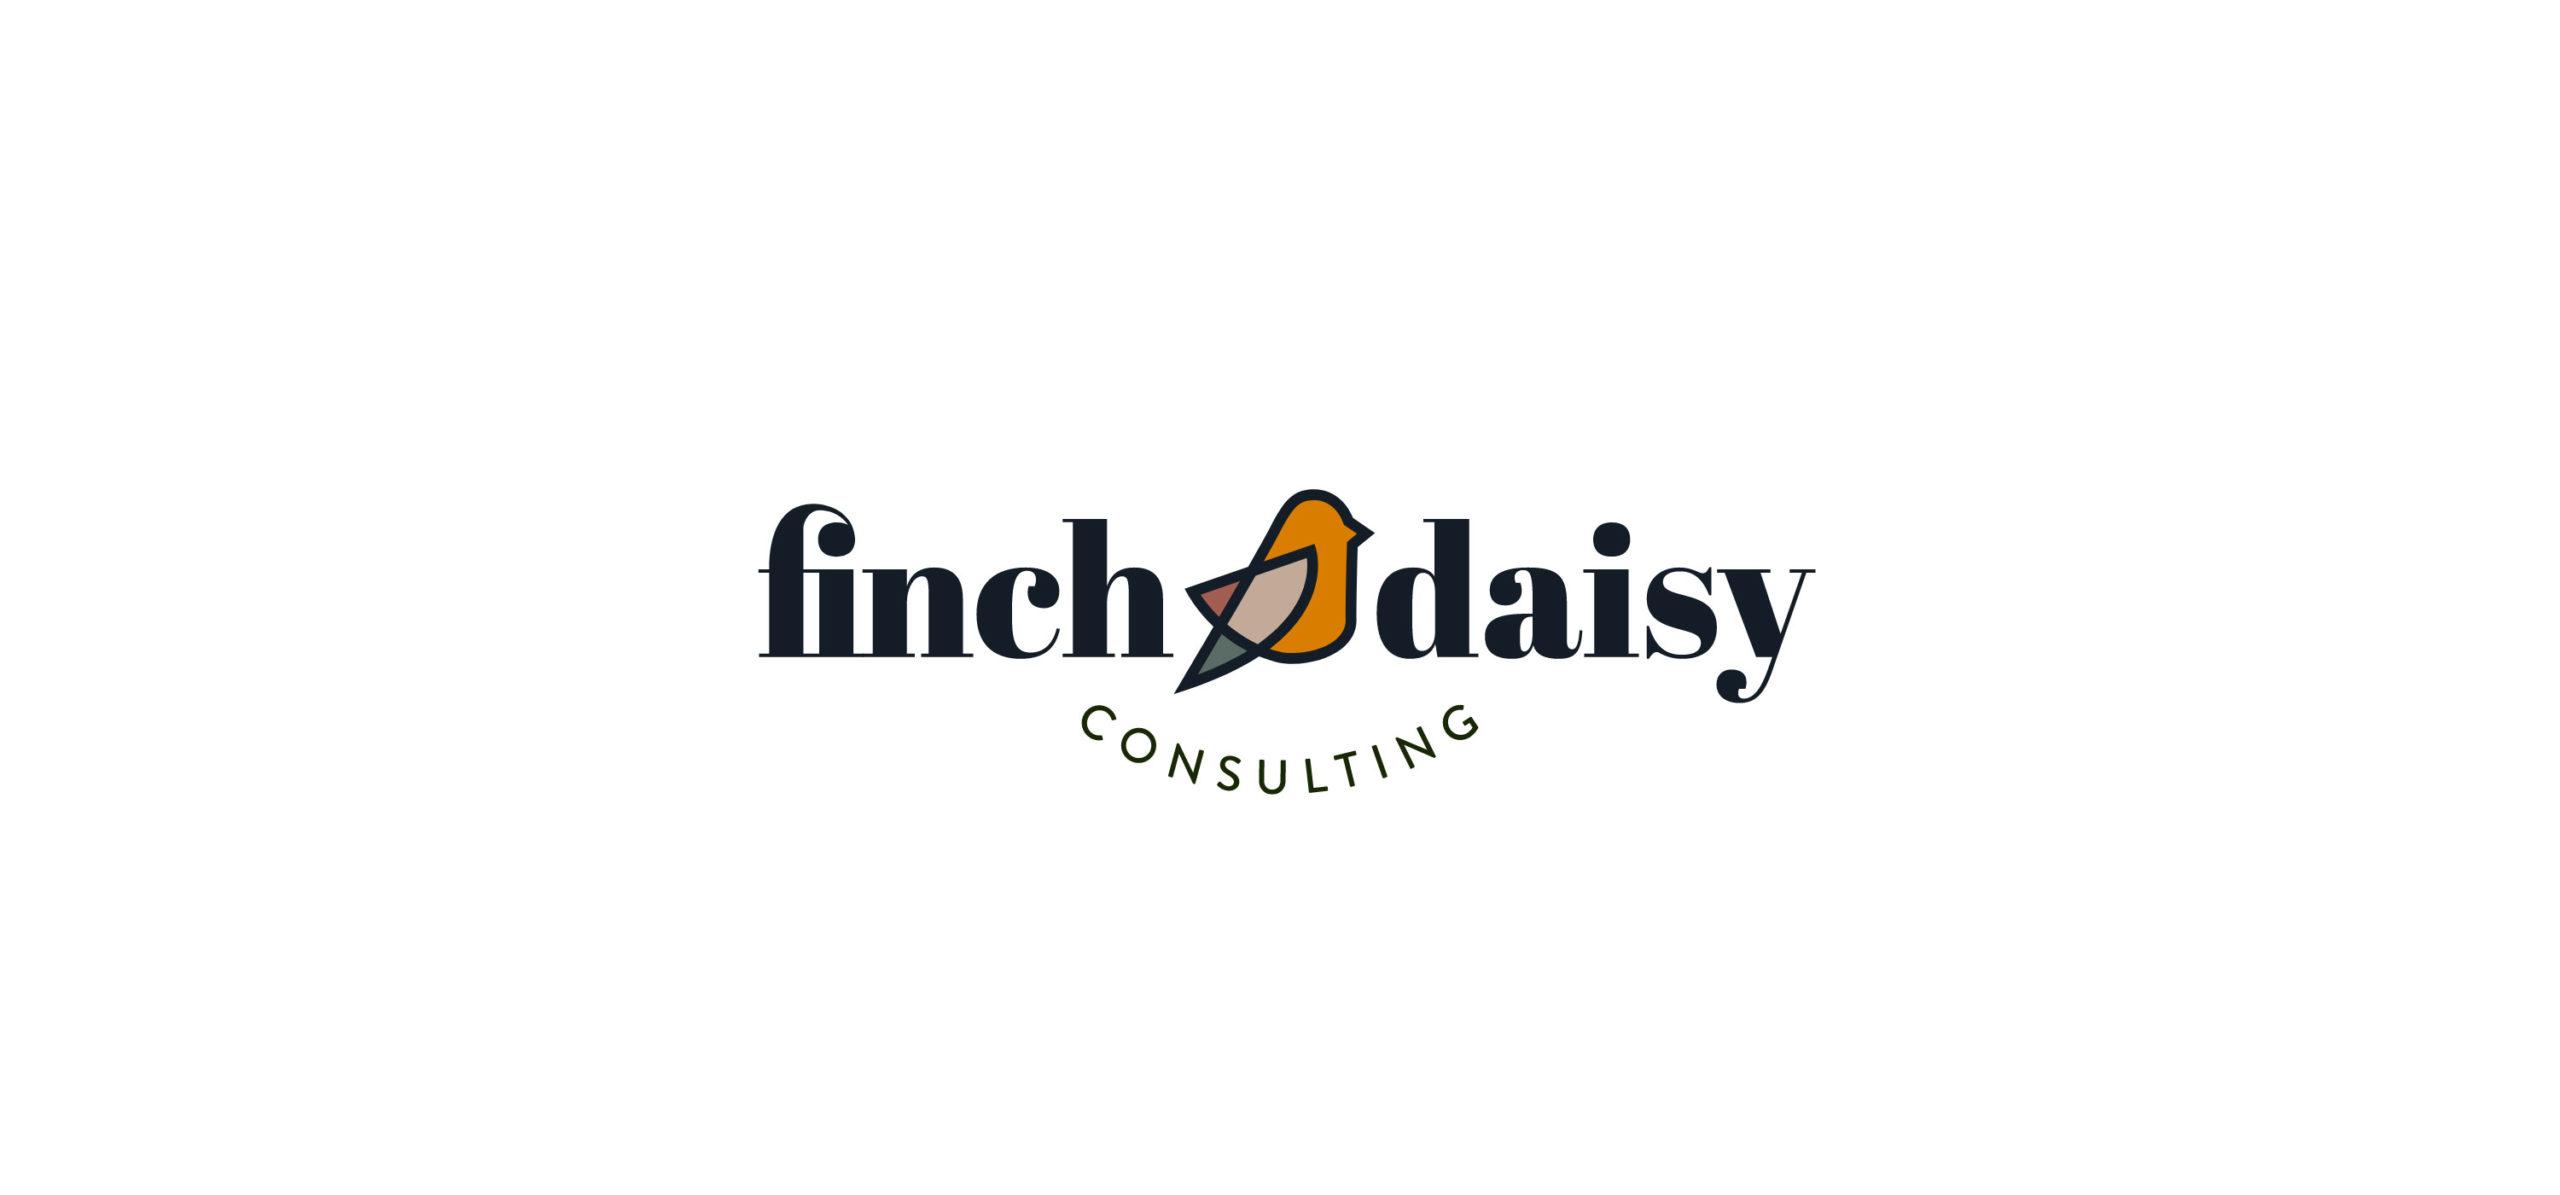 consulting-firm-logo-design-branding-agency